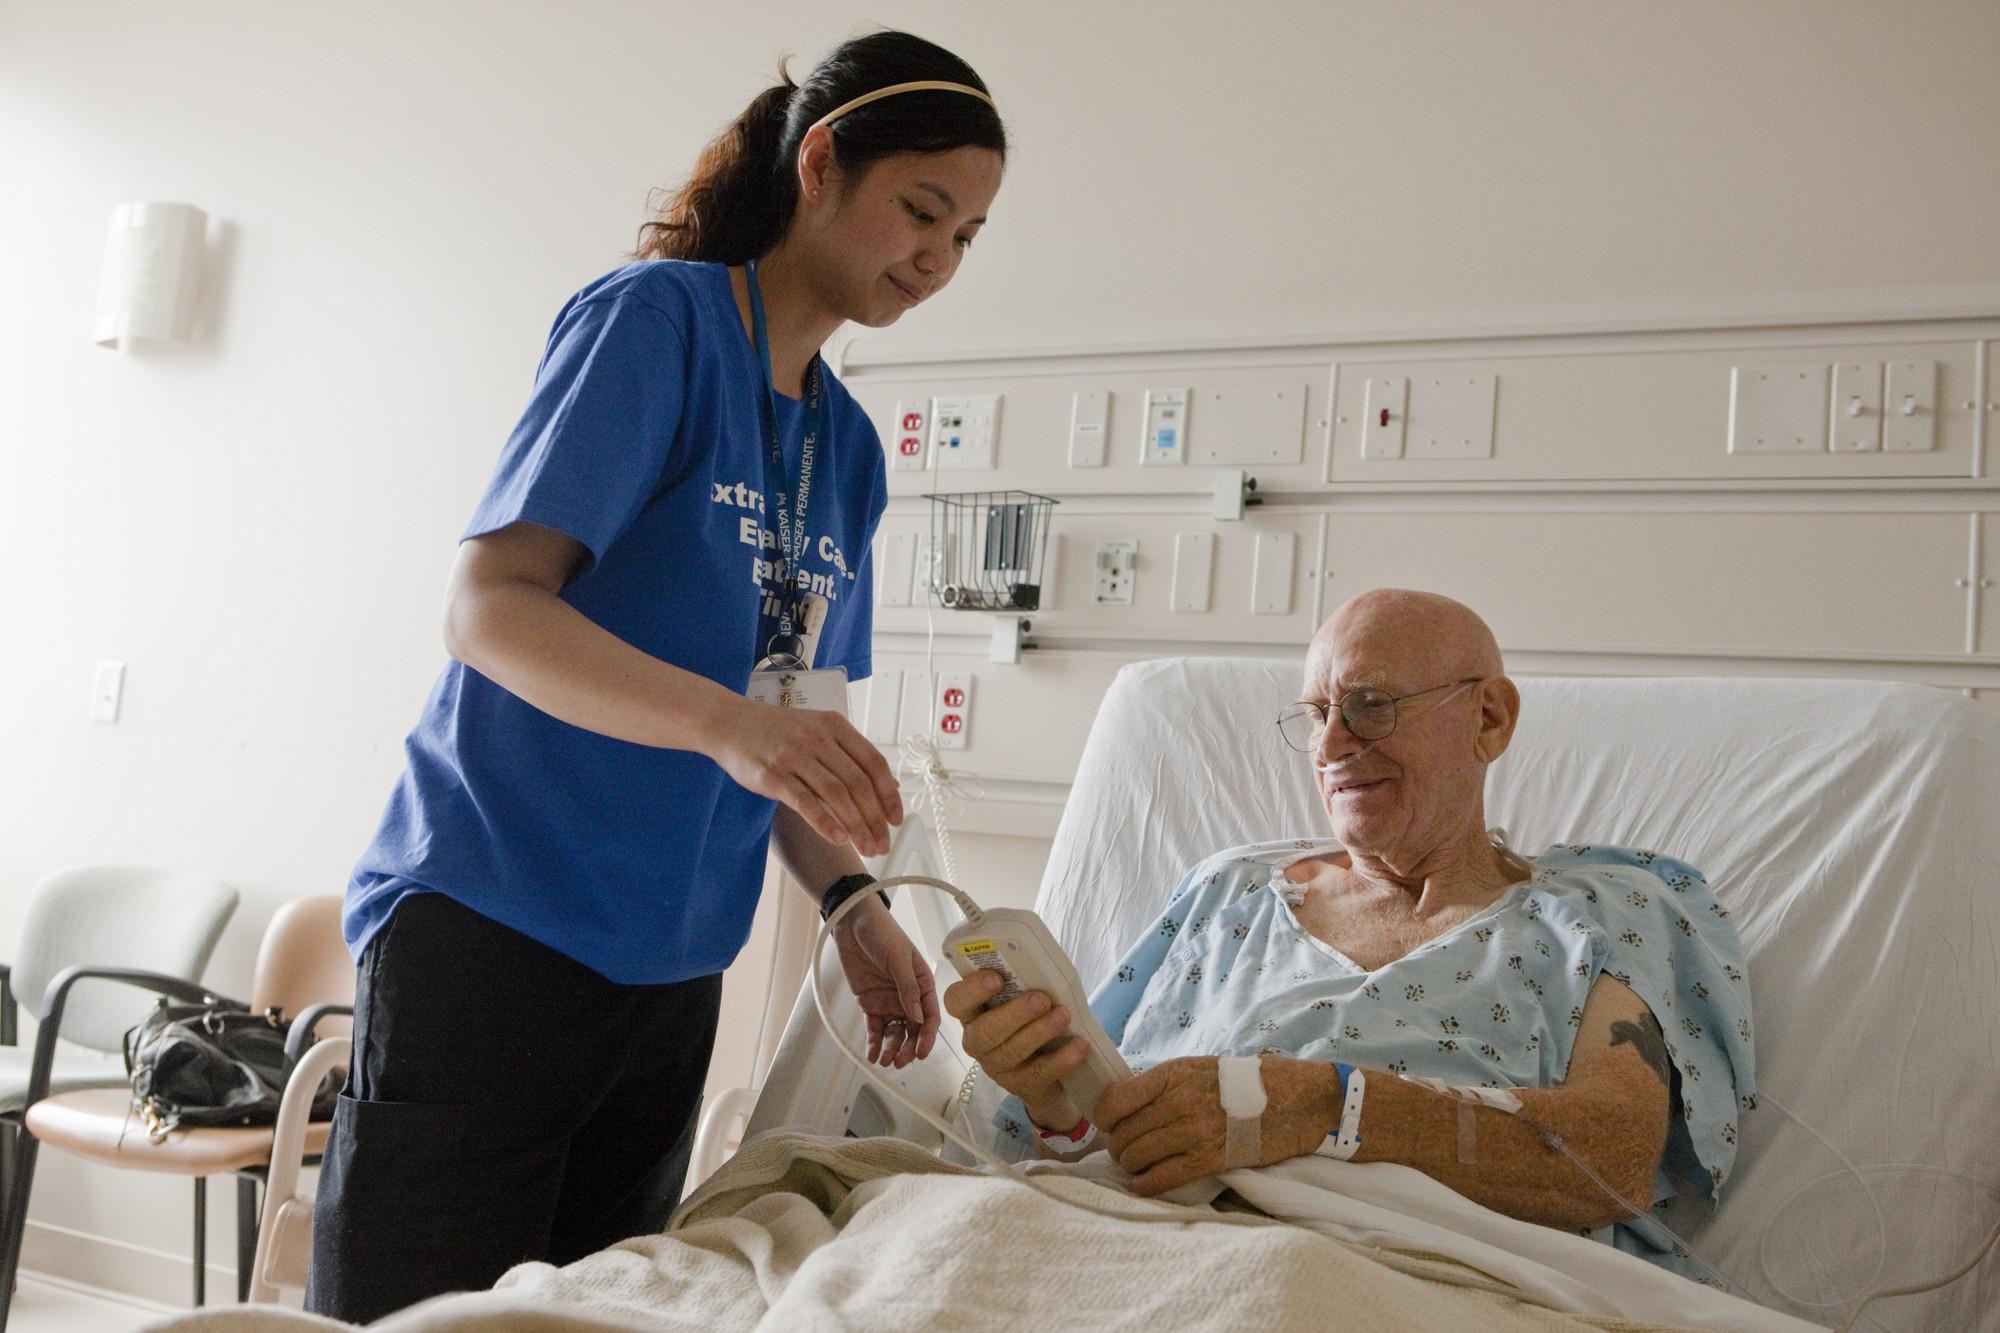 Irvine Medical Center RN Jennifer Nanasca.